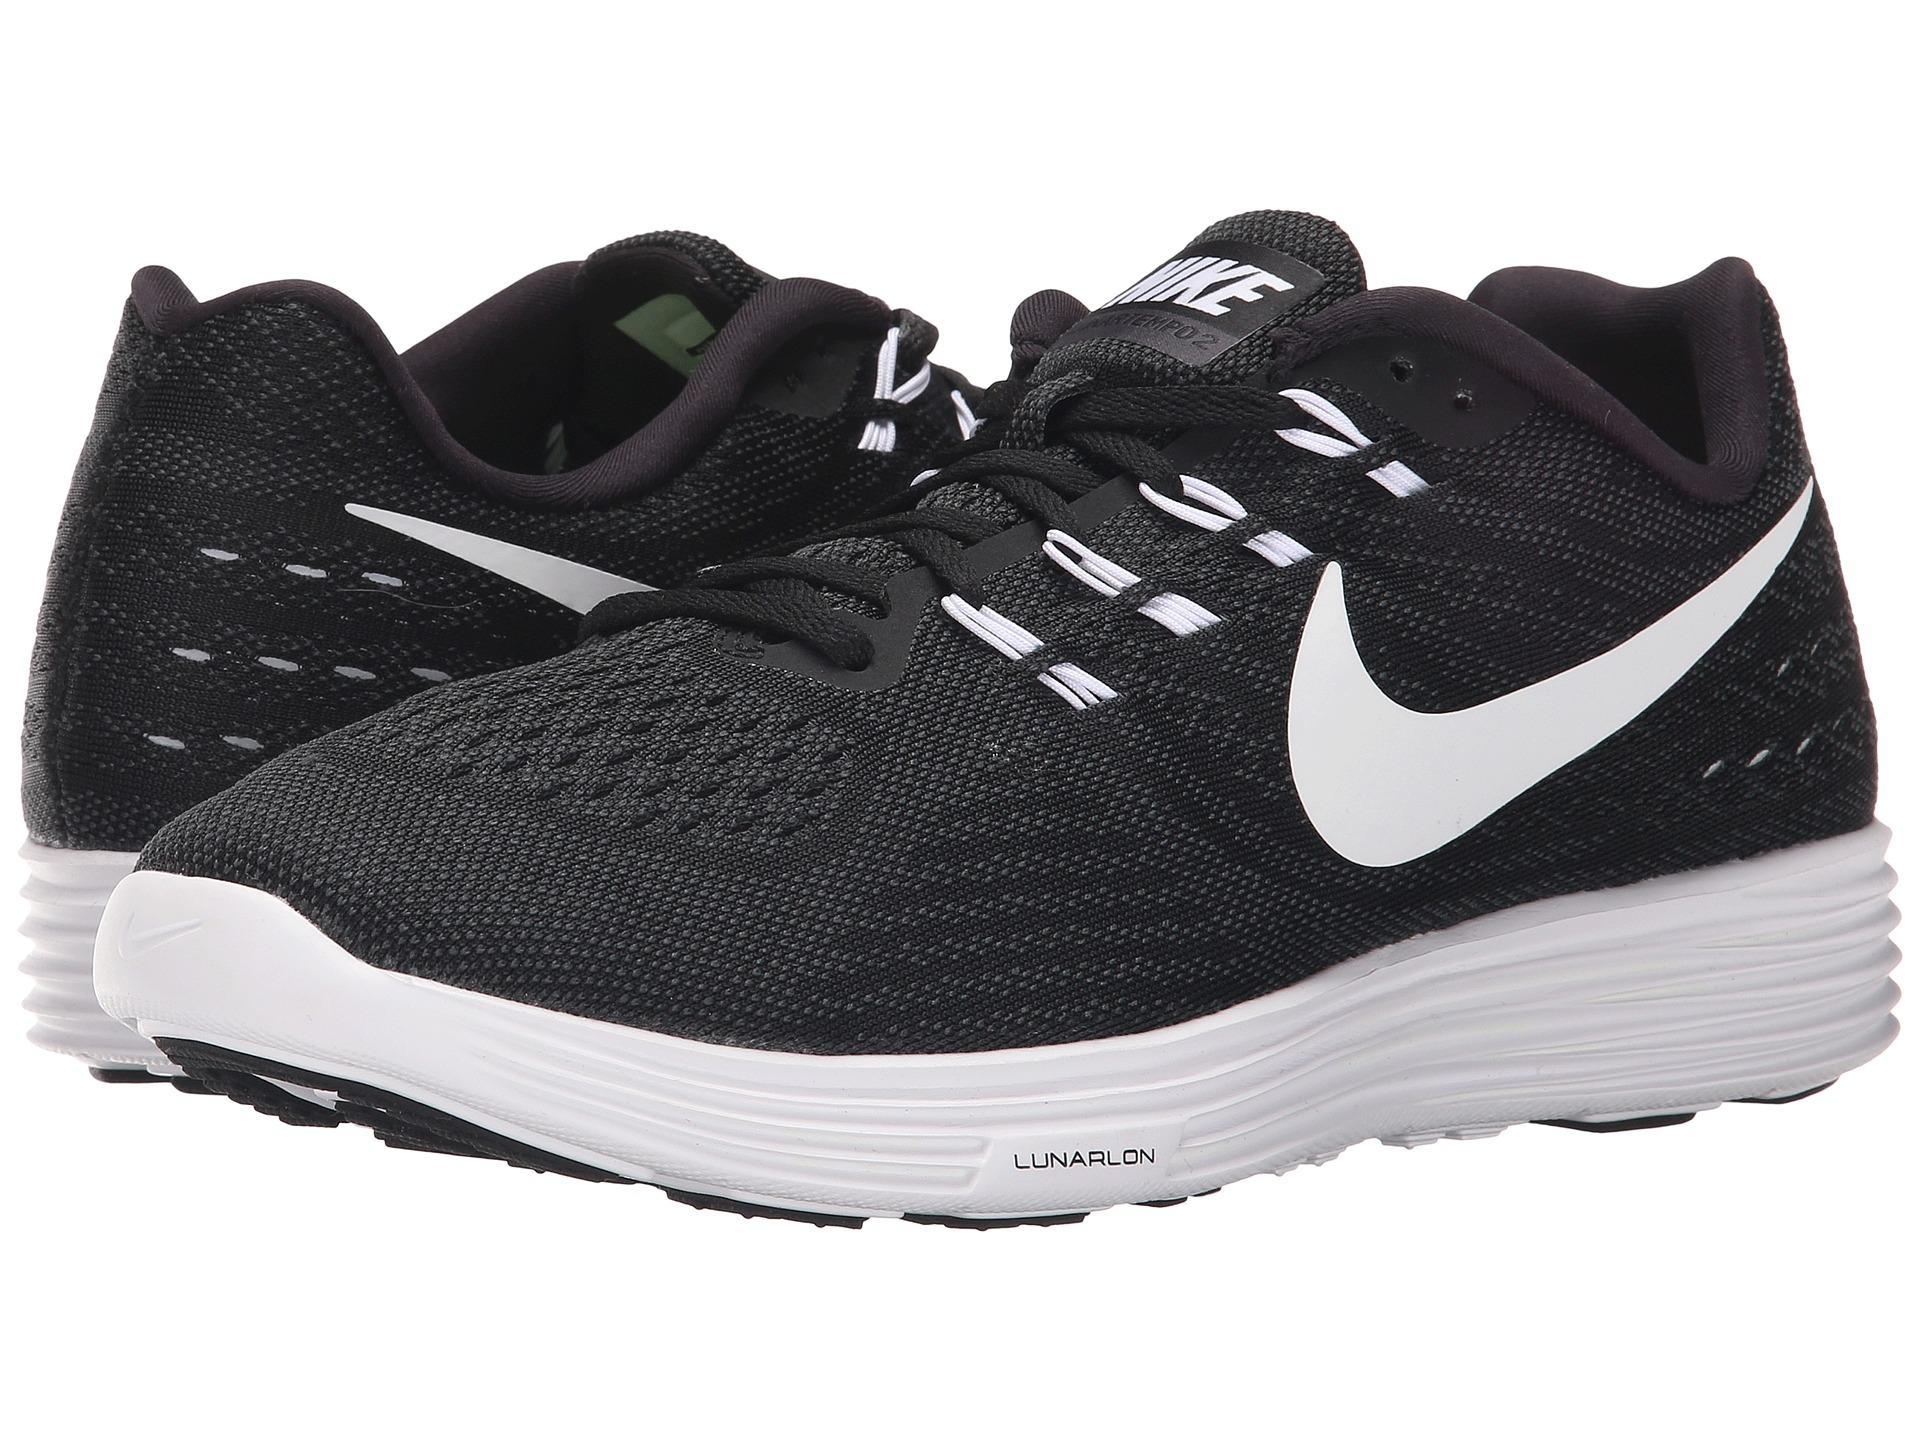 nike lunar running shoes men